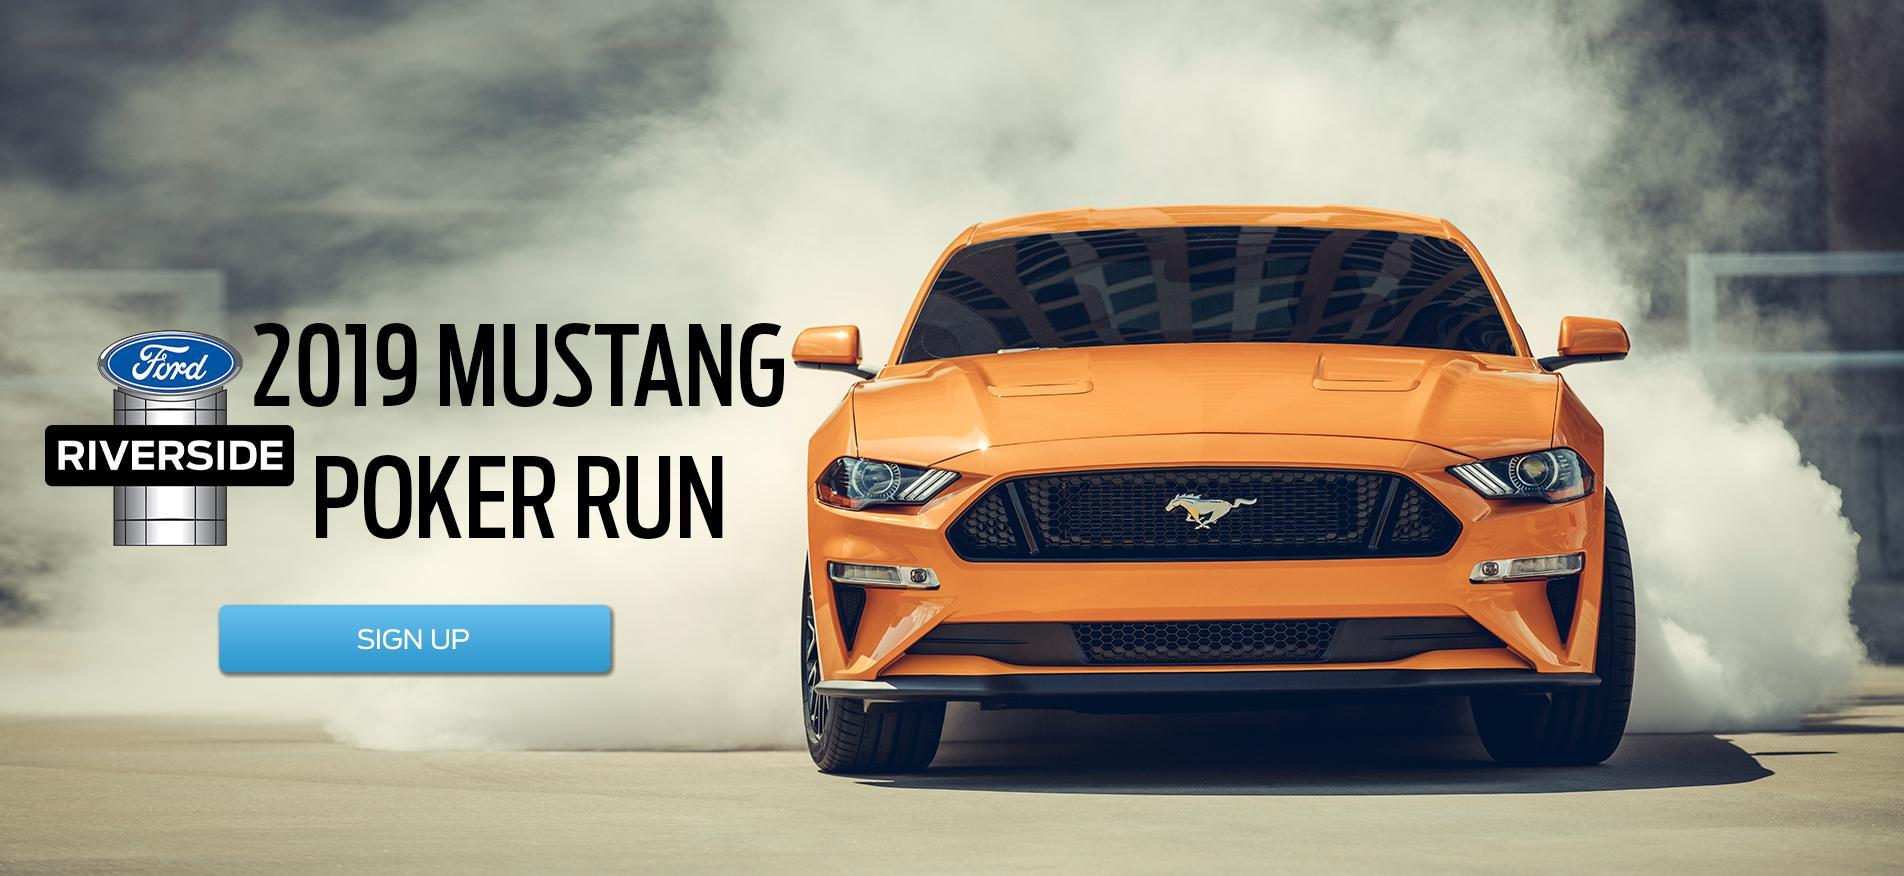 Mustang Poker Run